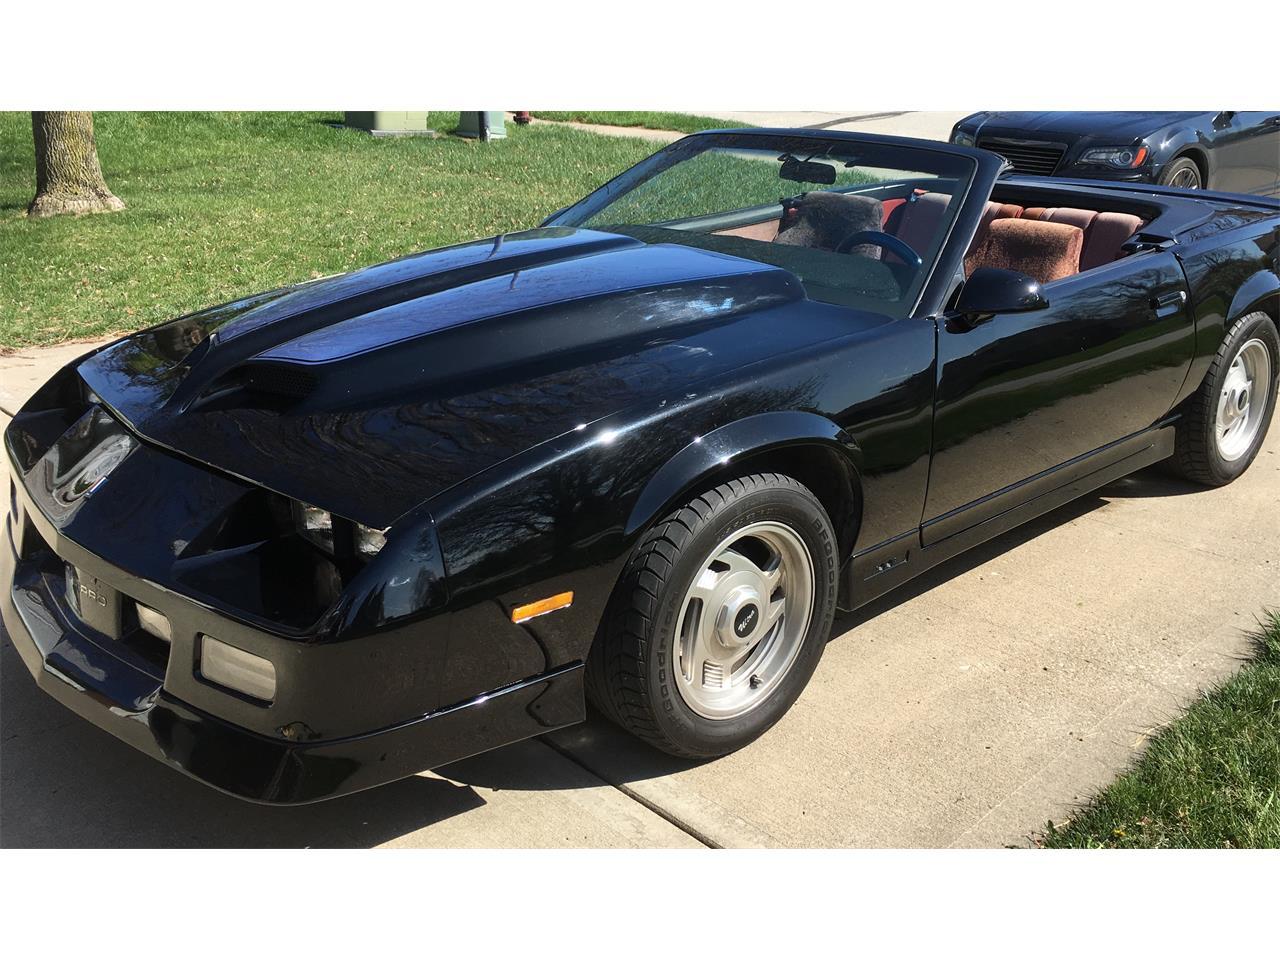 1989 Chevrolet Camaro IROC Z28 (CC-1236829) for sale in Platte City, Missouri